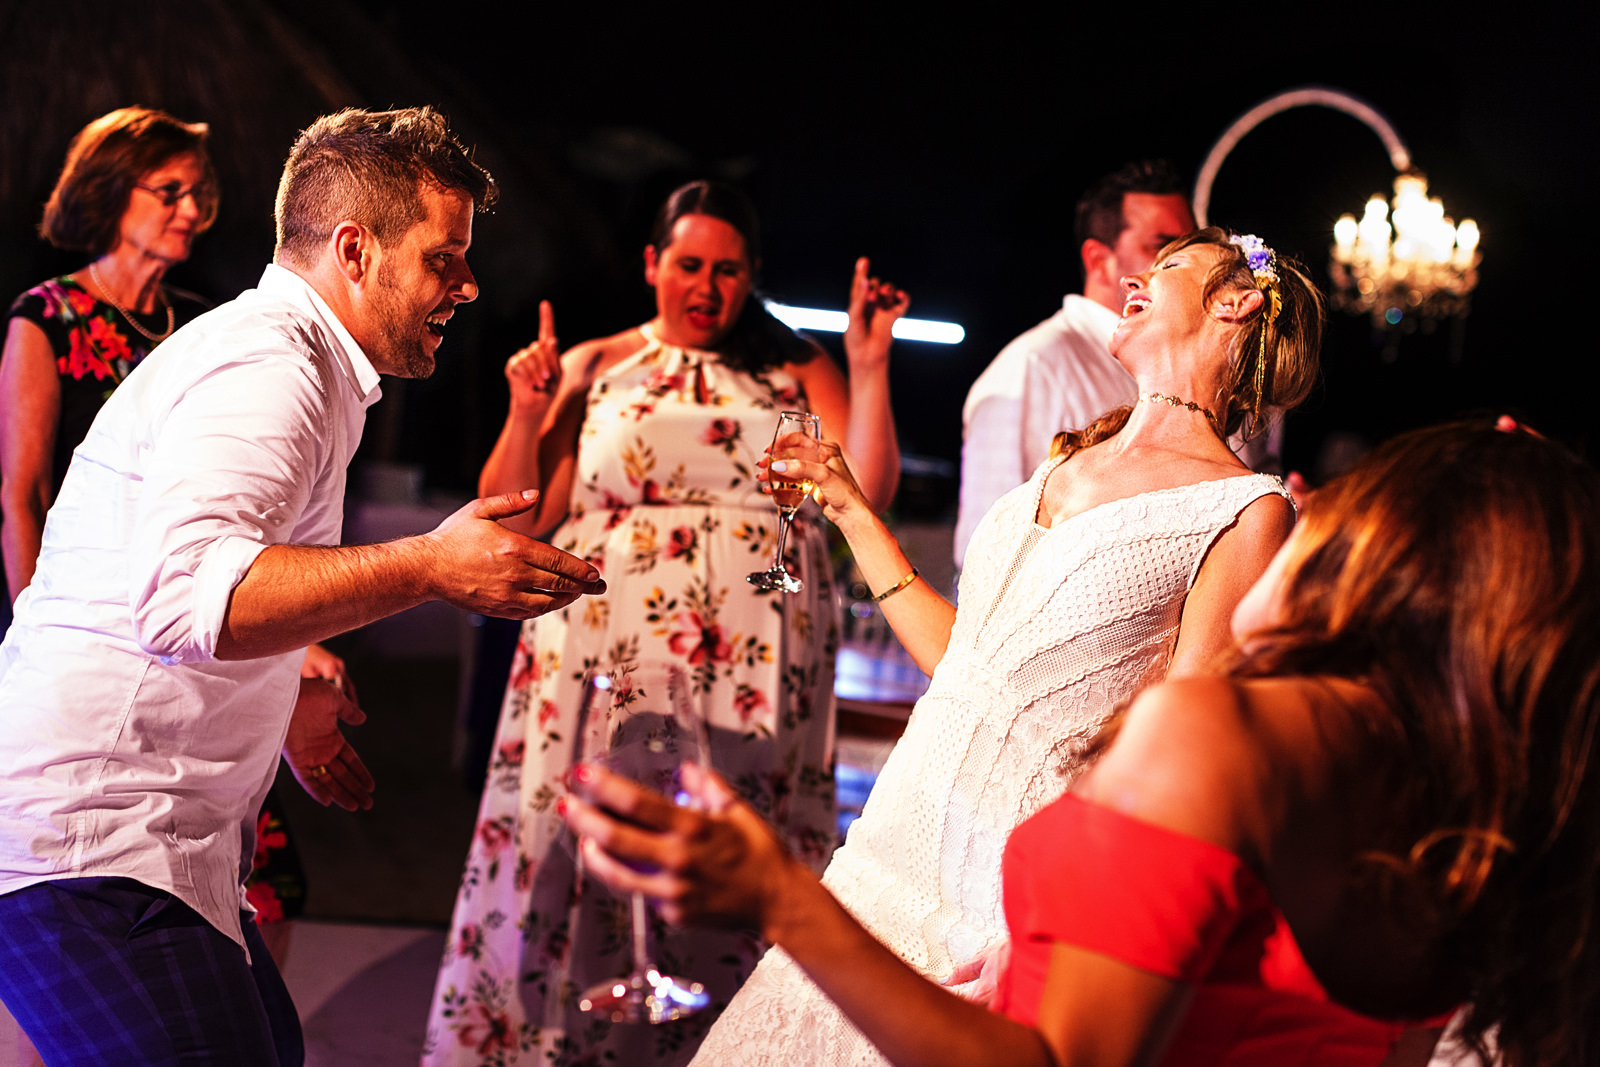 Groom and bride enjoying the dance floor singing and dancing